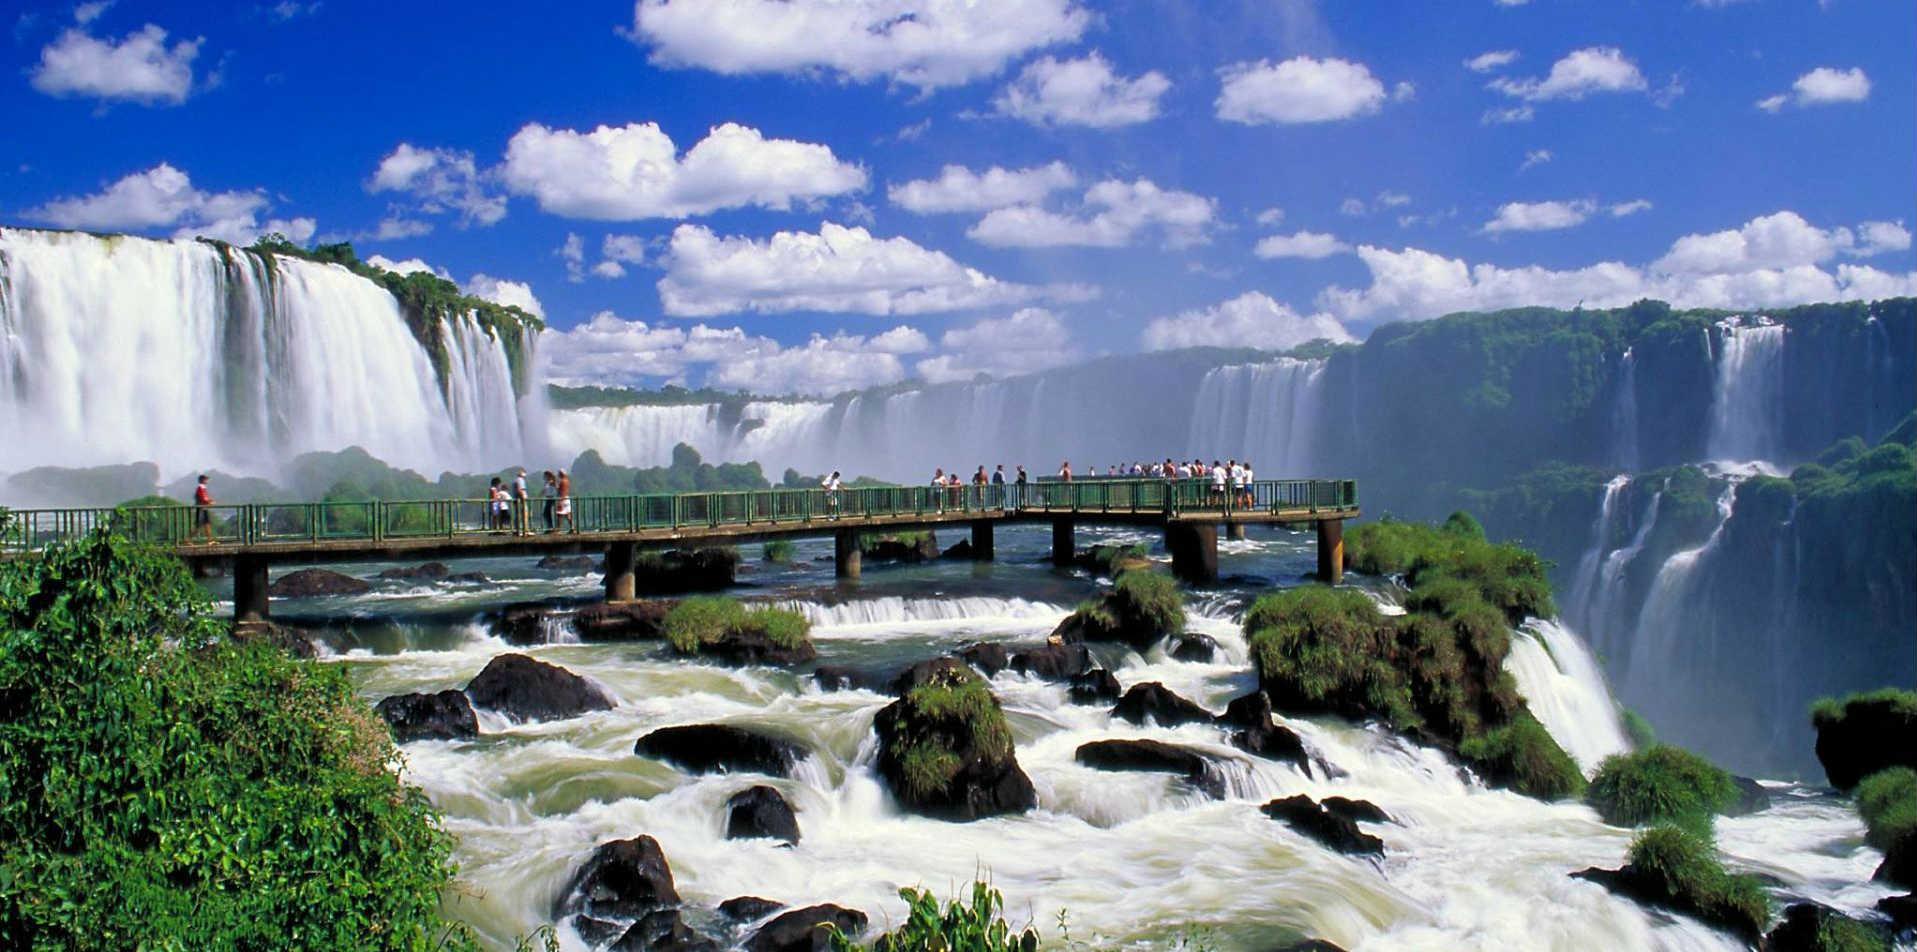 South Brazil - Iguassu falls